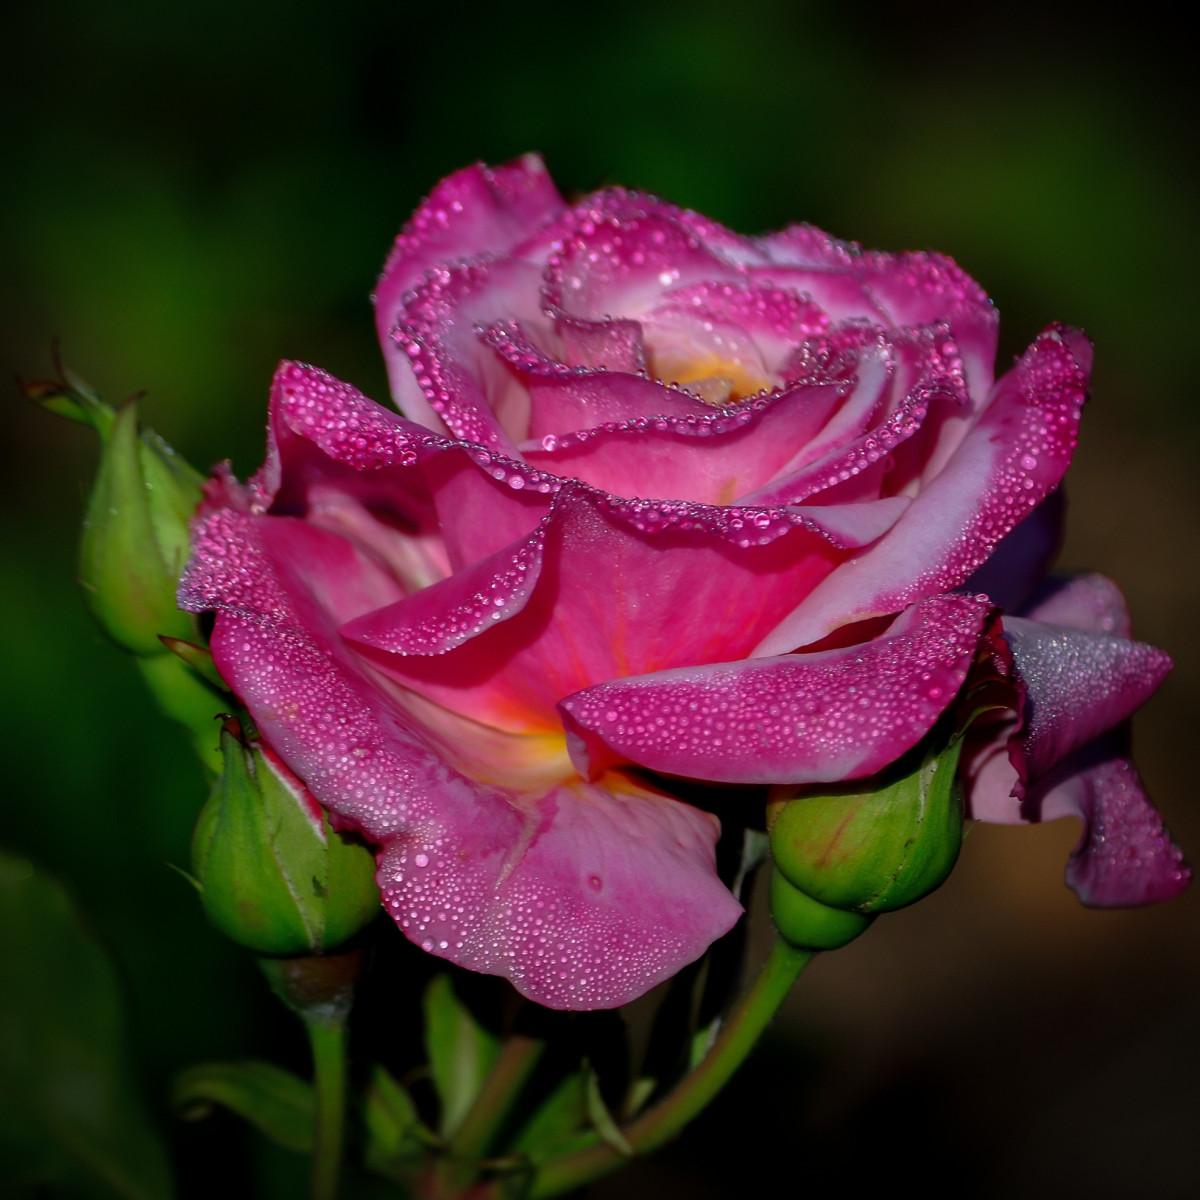 Garden Roses Flower Petal: Free Images : Flower, Petal, Close Up, Raindrops, Macro